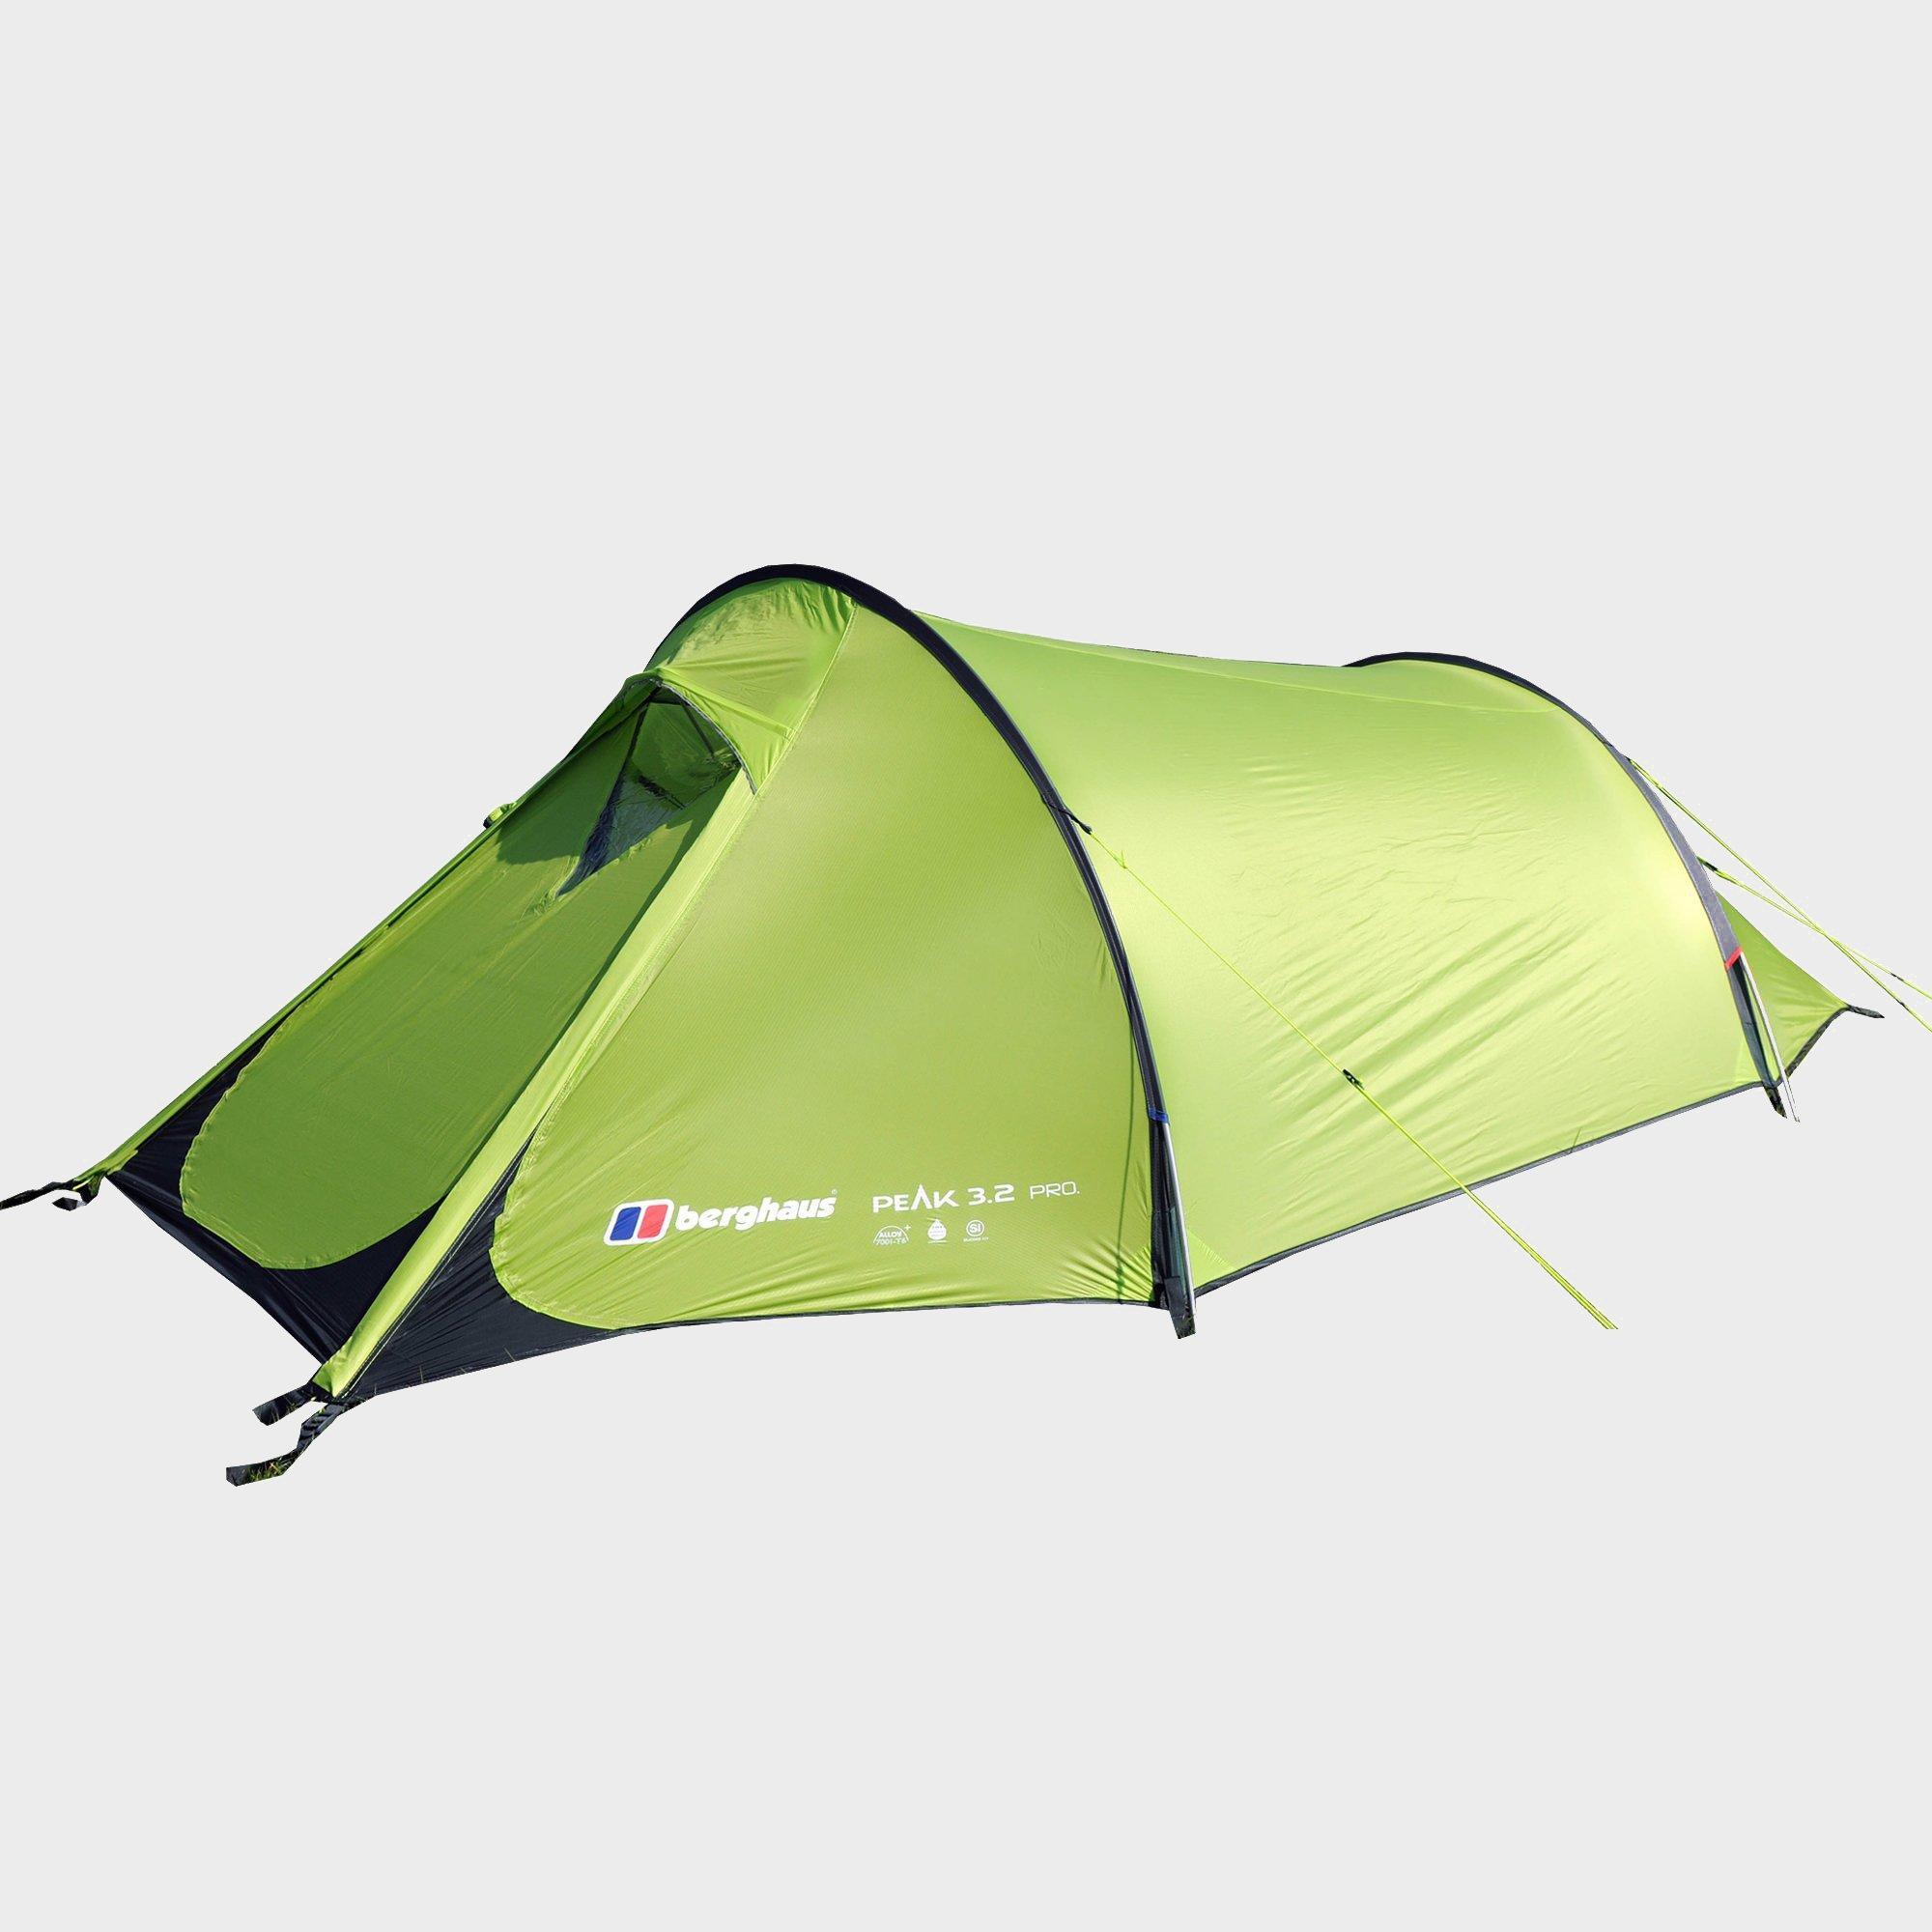 9310056a2 New Berghaus Peak 3.2 Pro Tent Camping Gear Camping Equipment ...